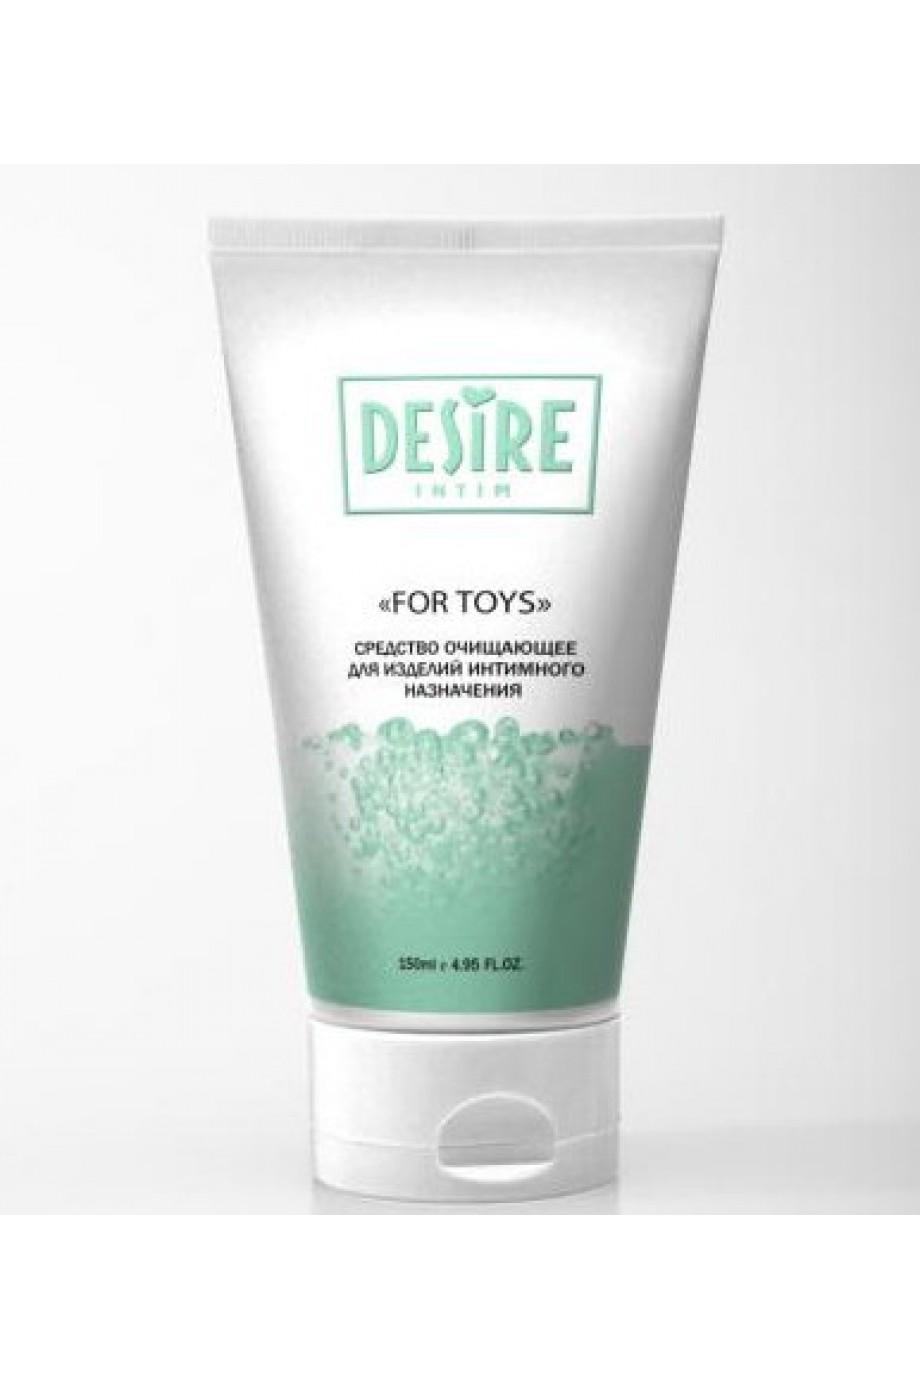 Очищающее средство For Toys Desire, 150 мл